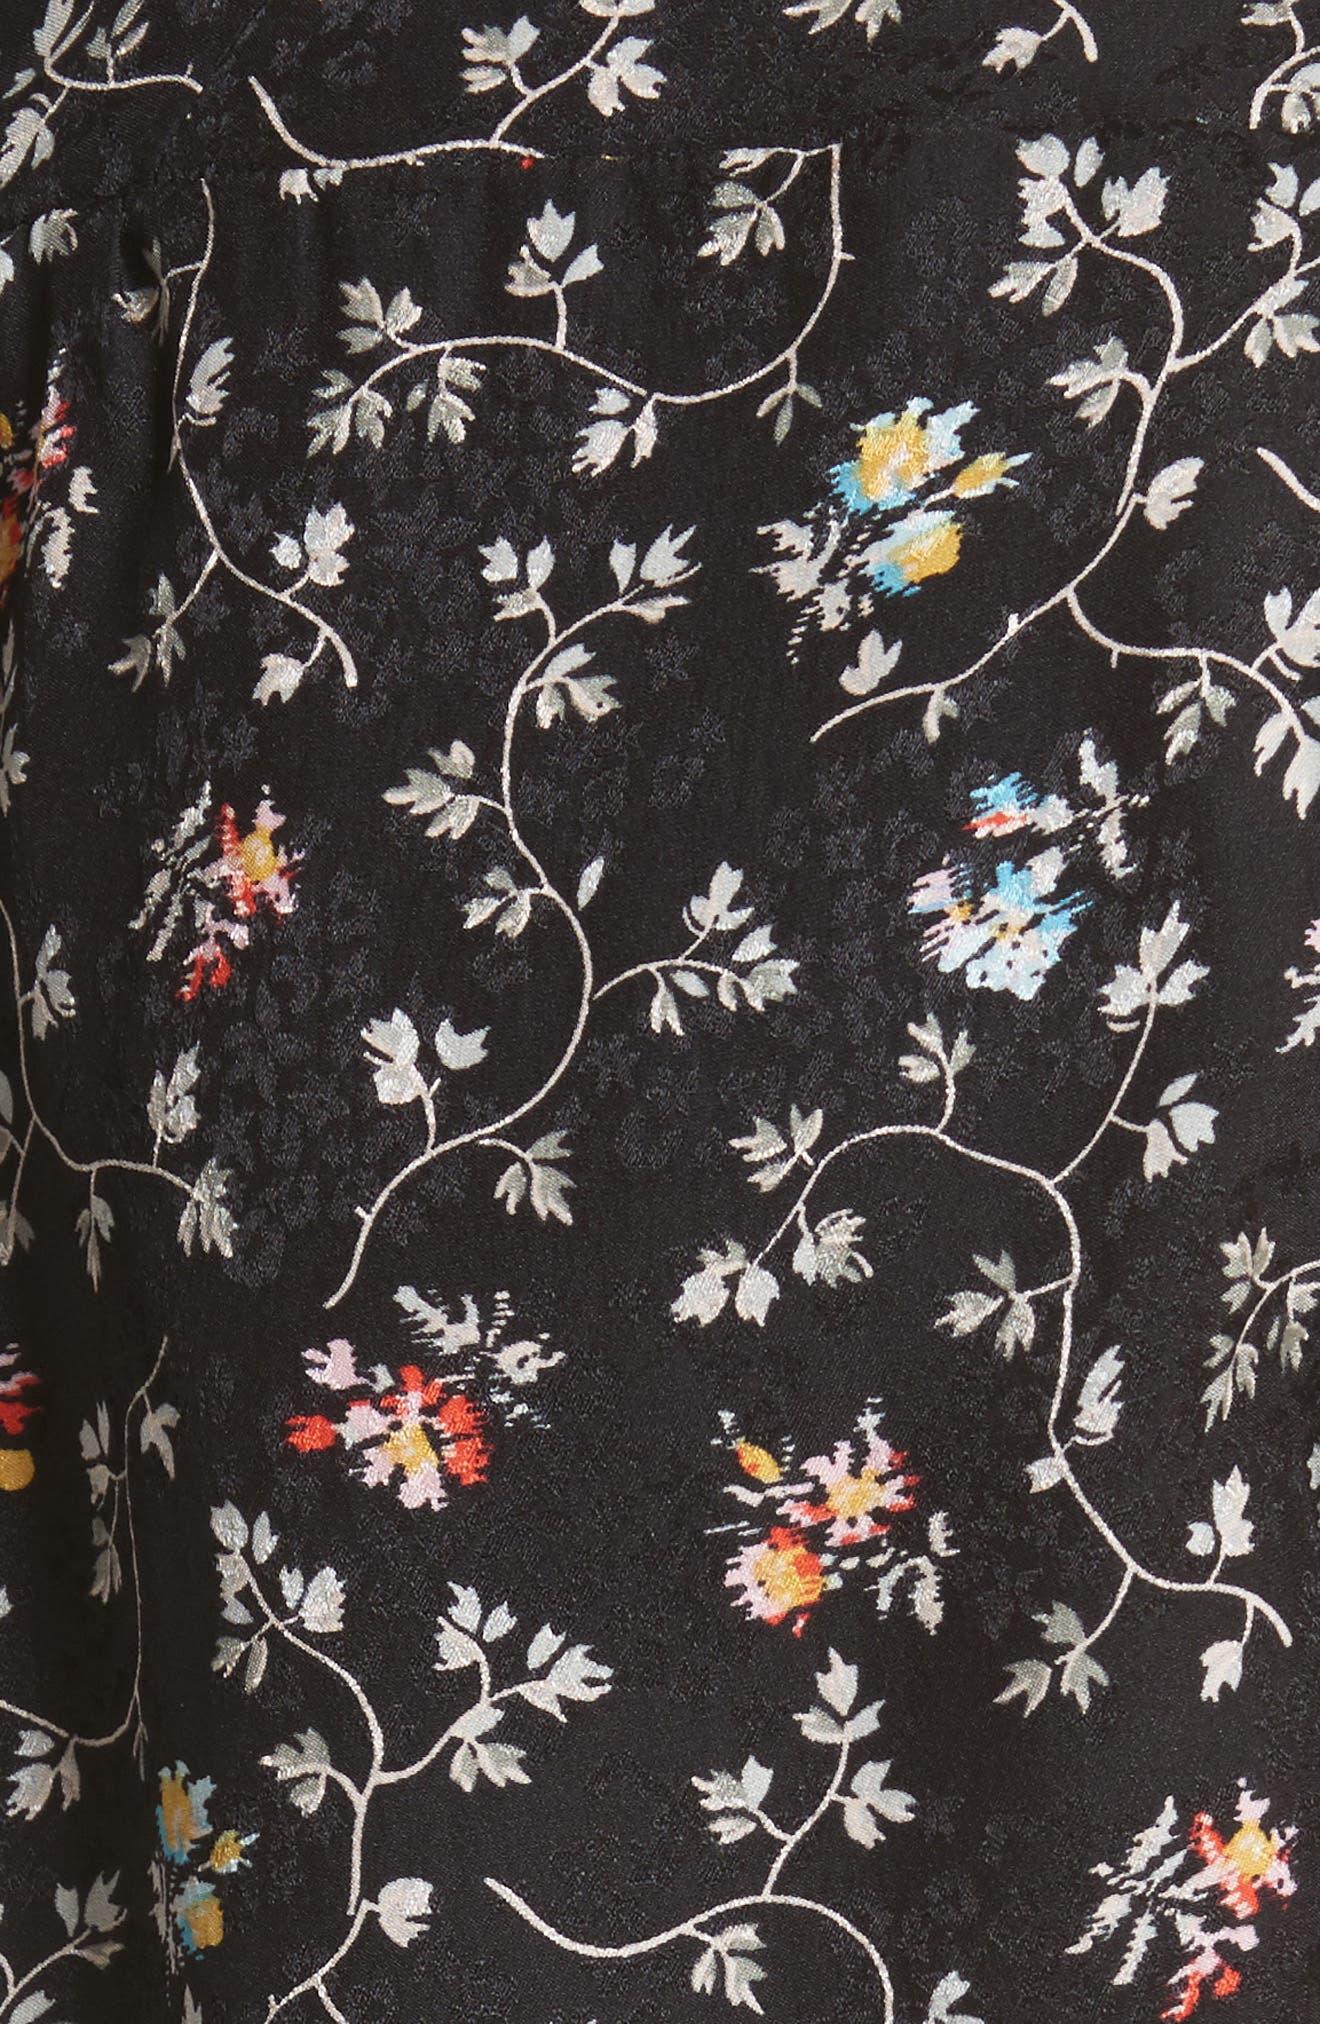 Vine Band Collar Silk Top,                             Alternate thumbnail 5, color,                             Black